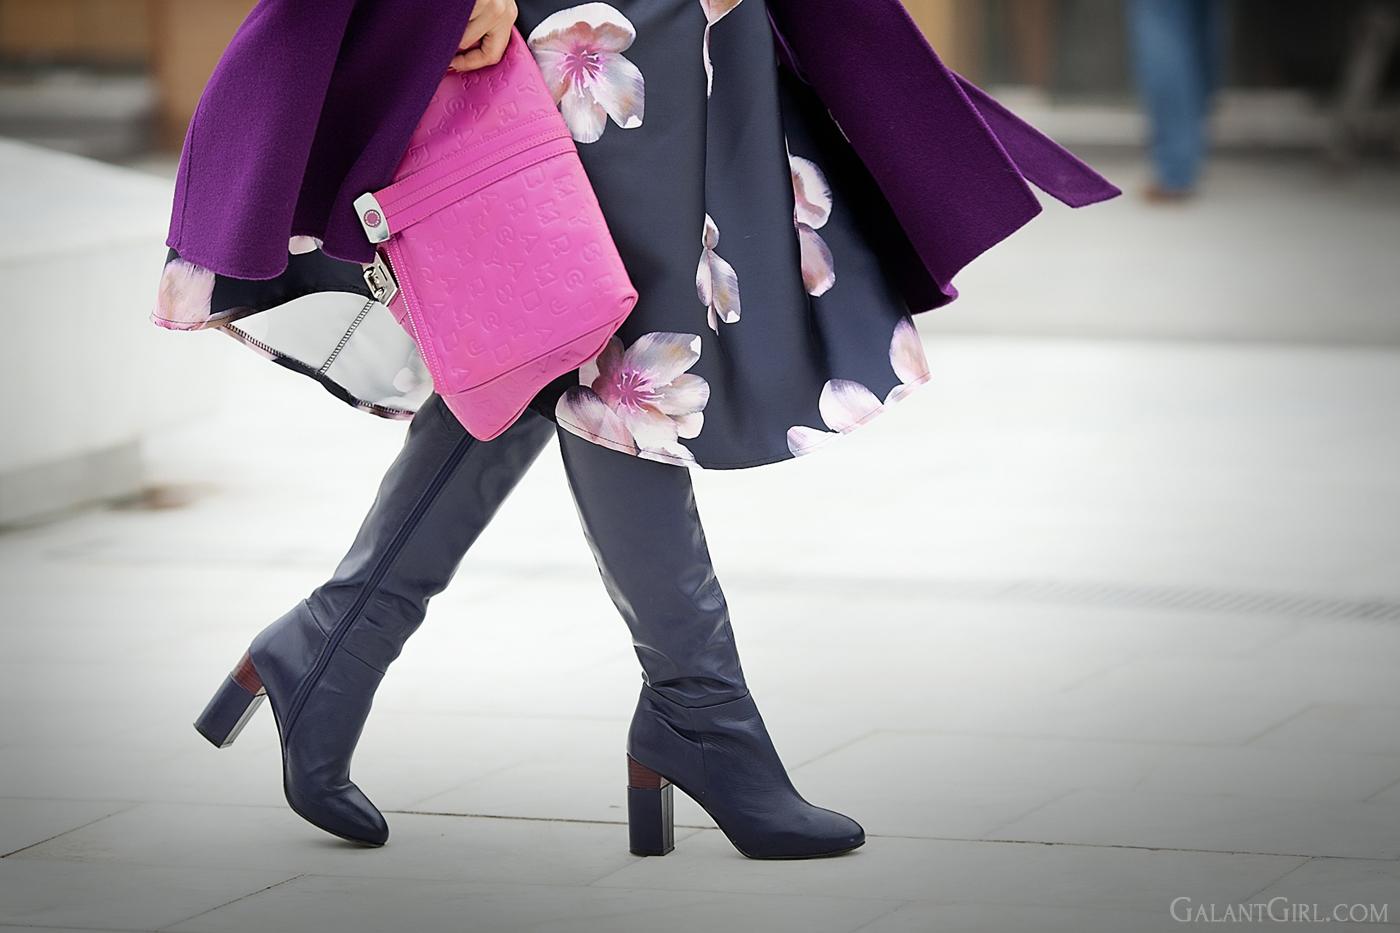 floral print midi skirt outfit on GalantGirl.com